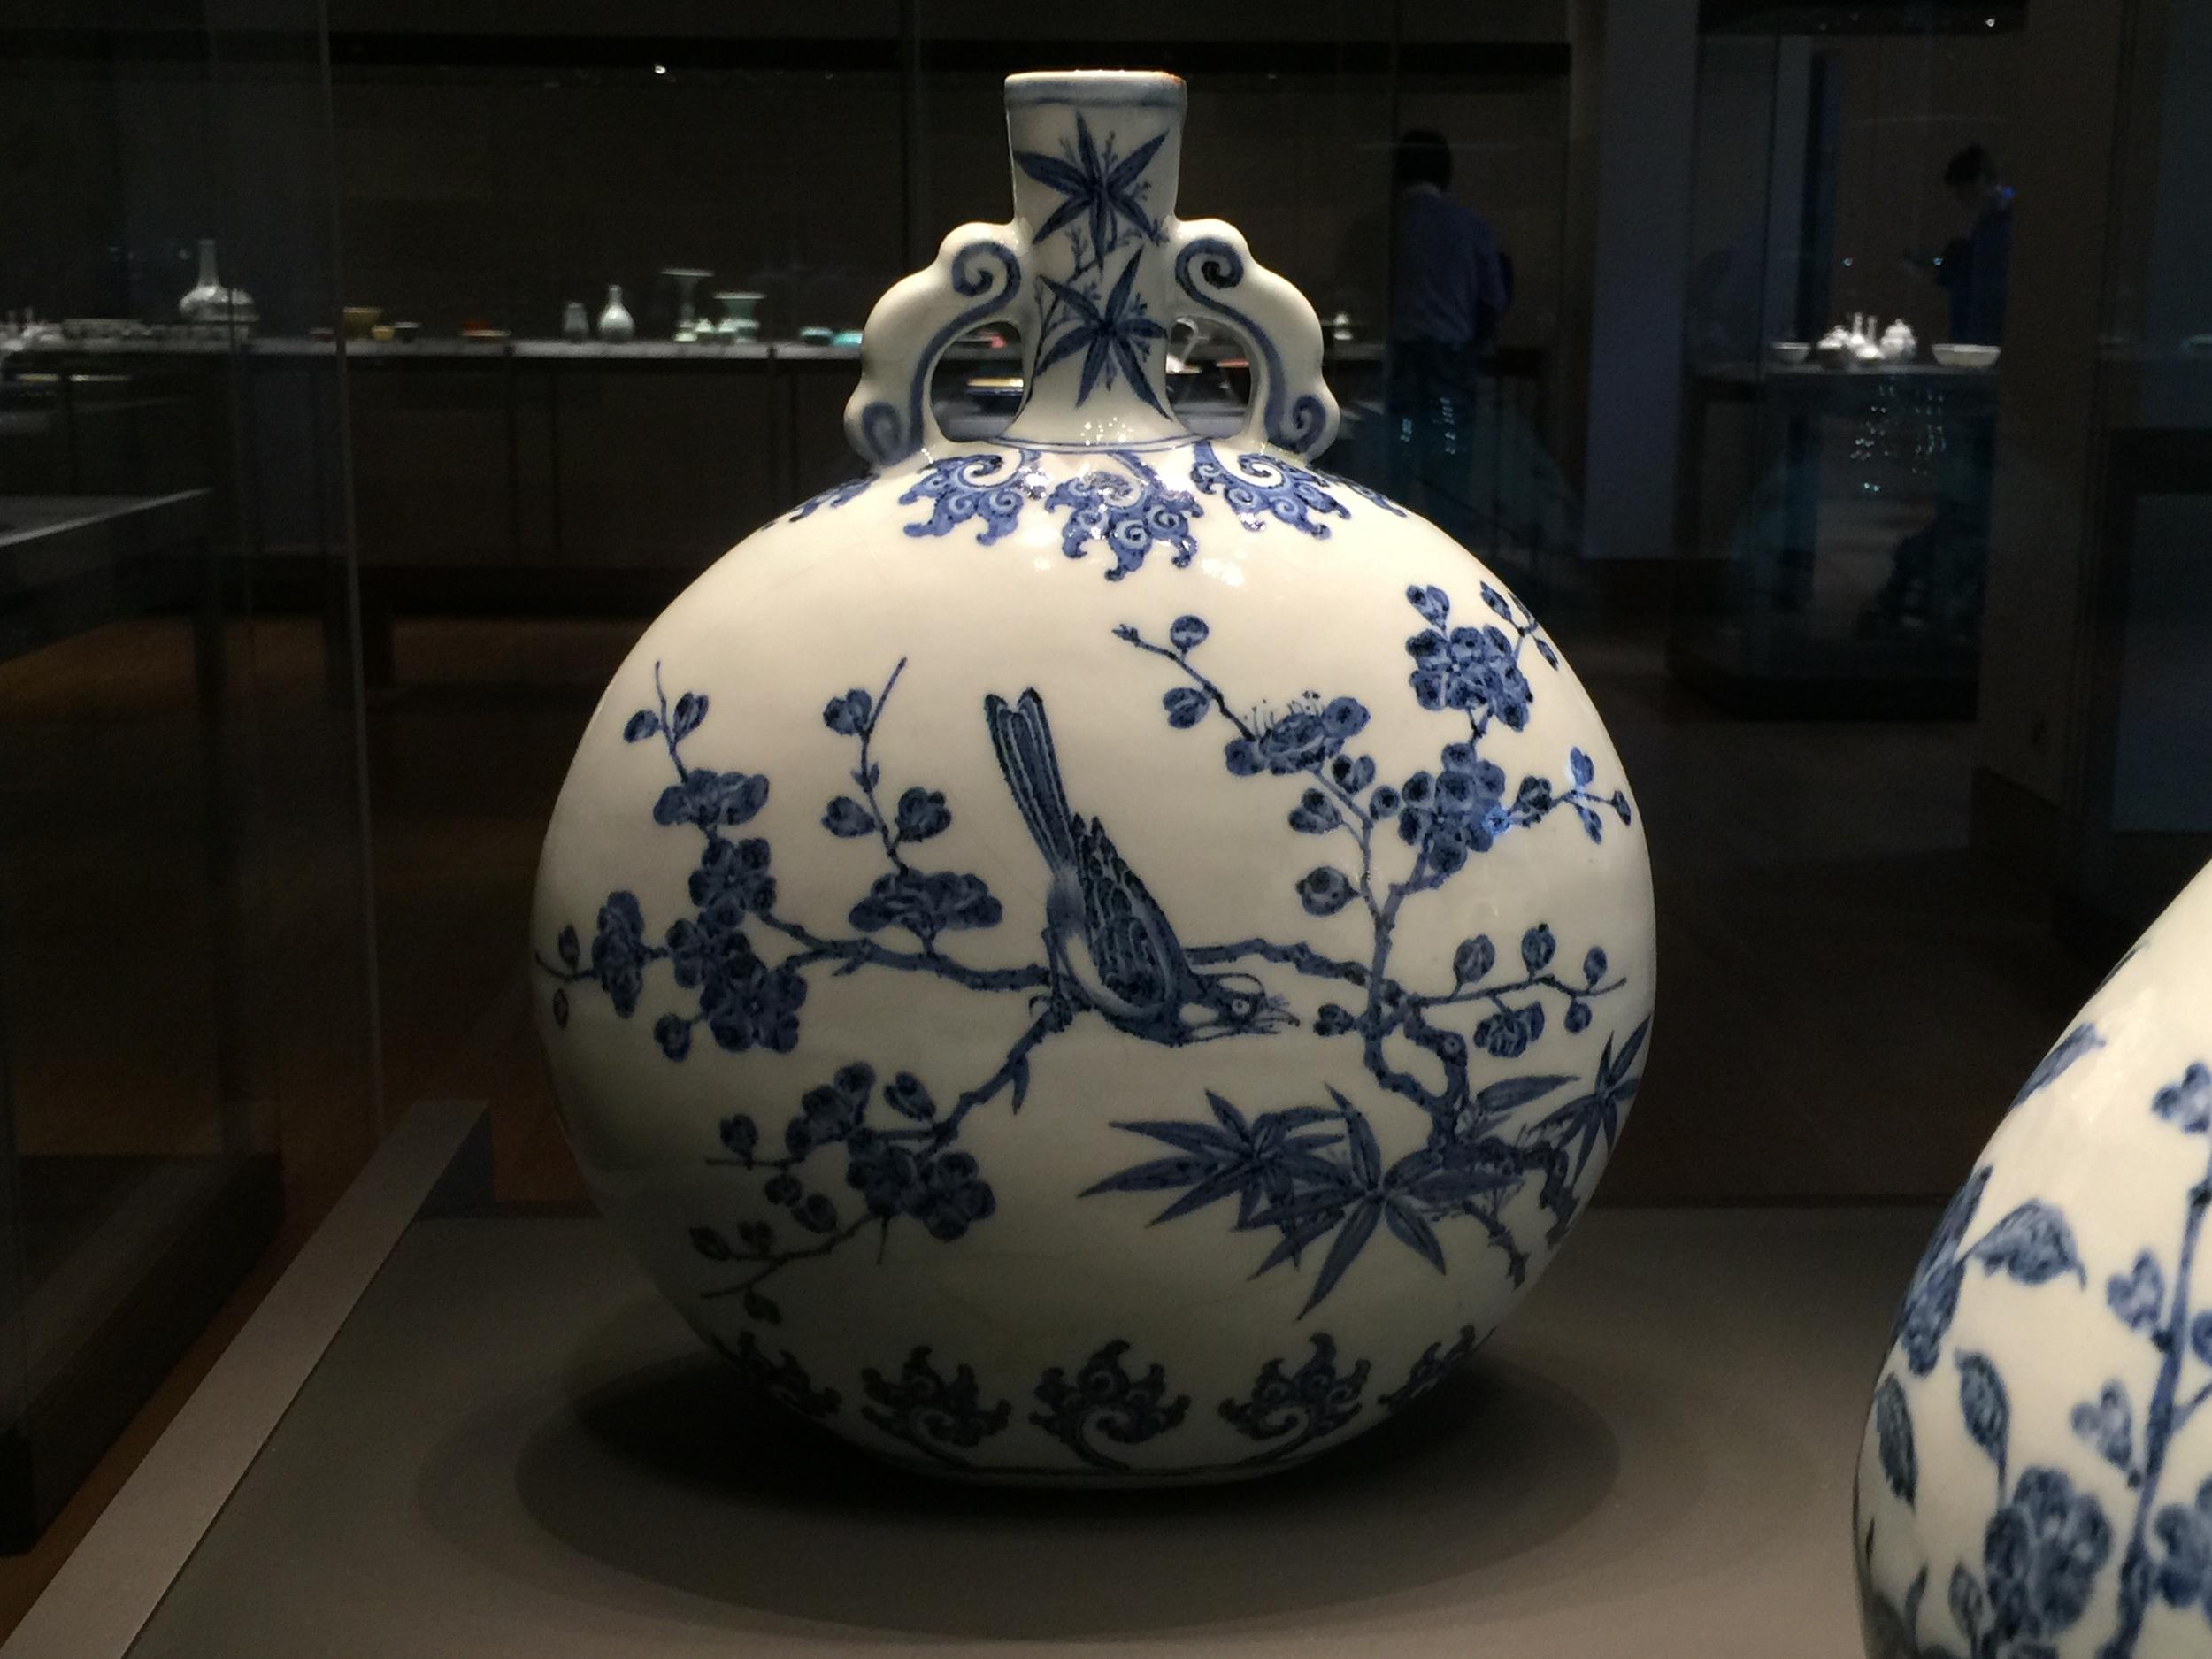 Chinese-Porcelain-British-Museum-Percival-David-jessewaugh.com-47.jpg